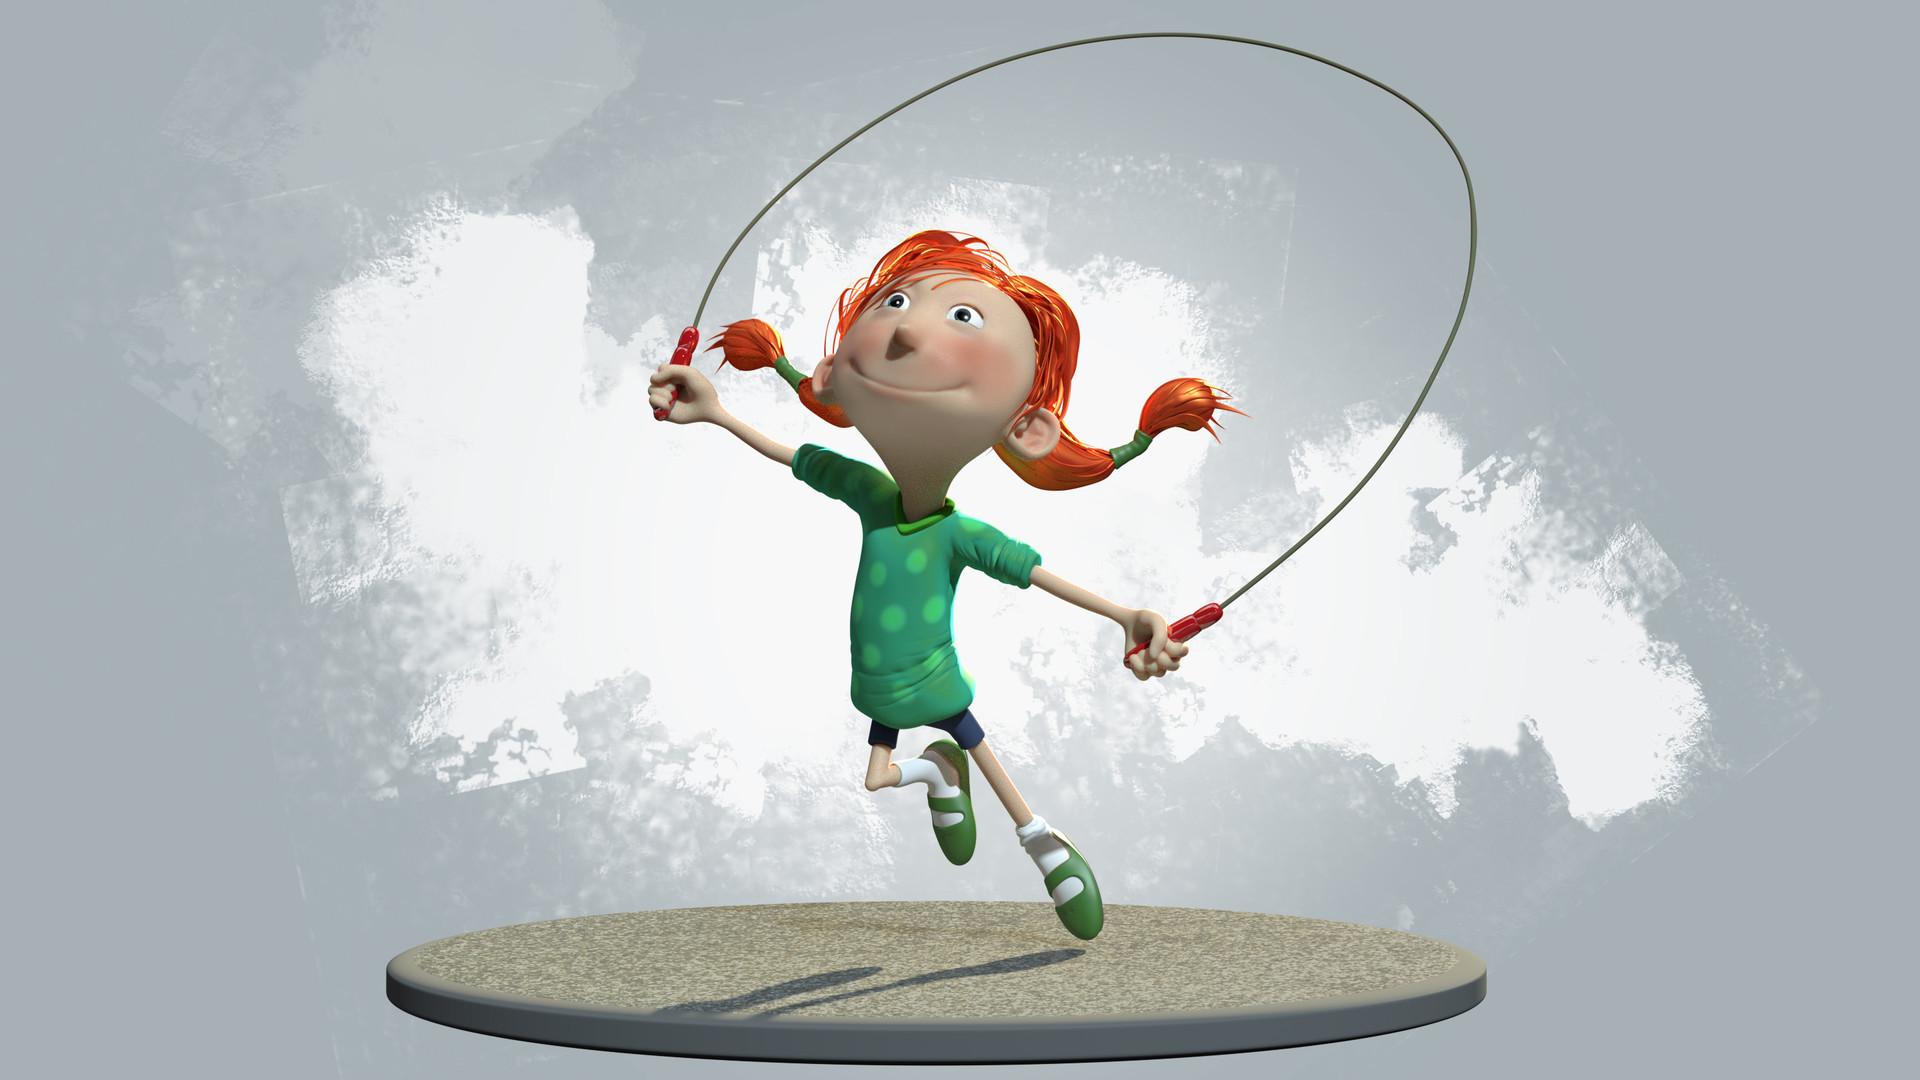 Skipping girl